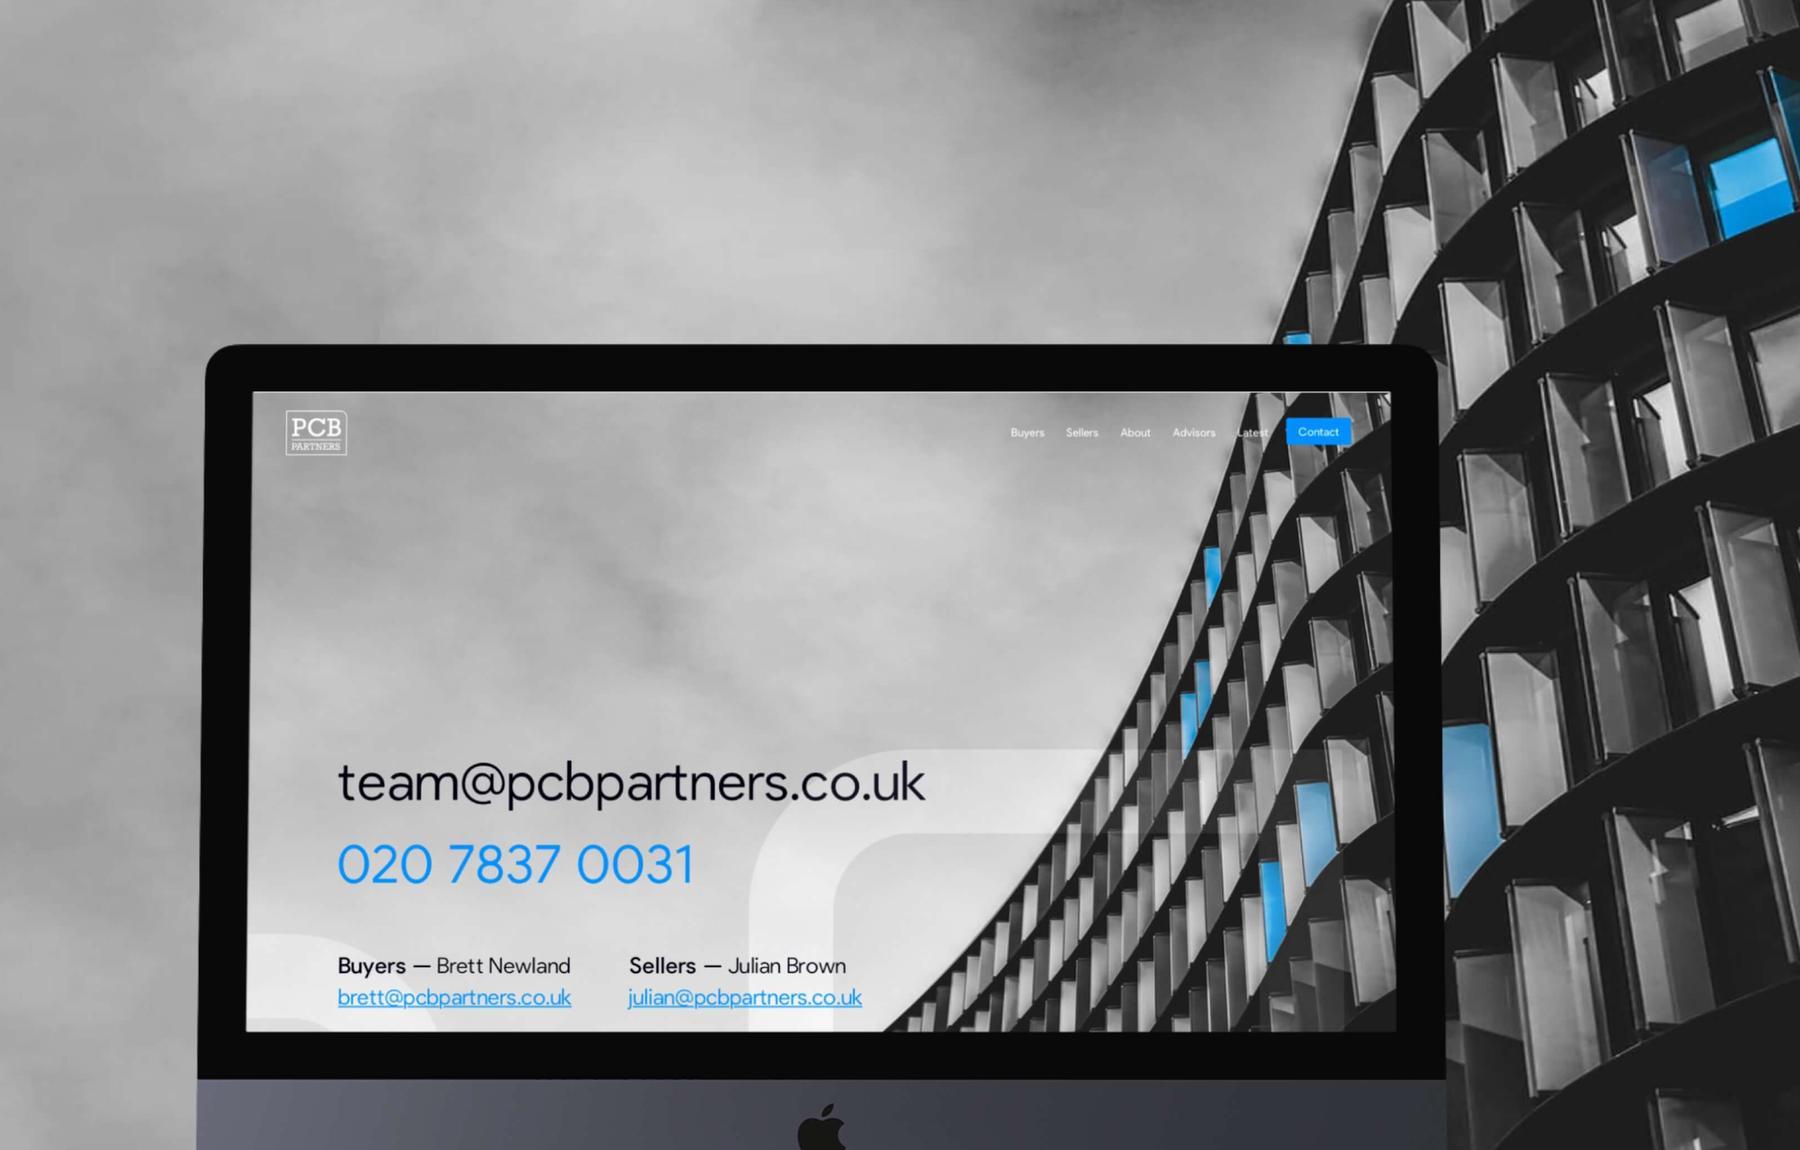 PCB partners case study - MWB create bespoke responsive website design and development